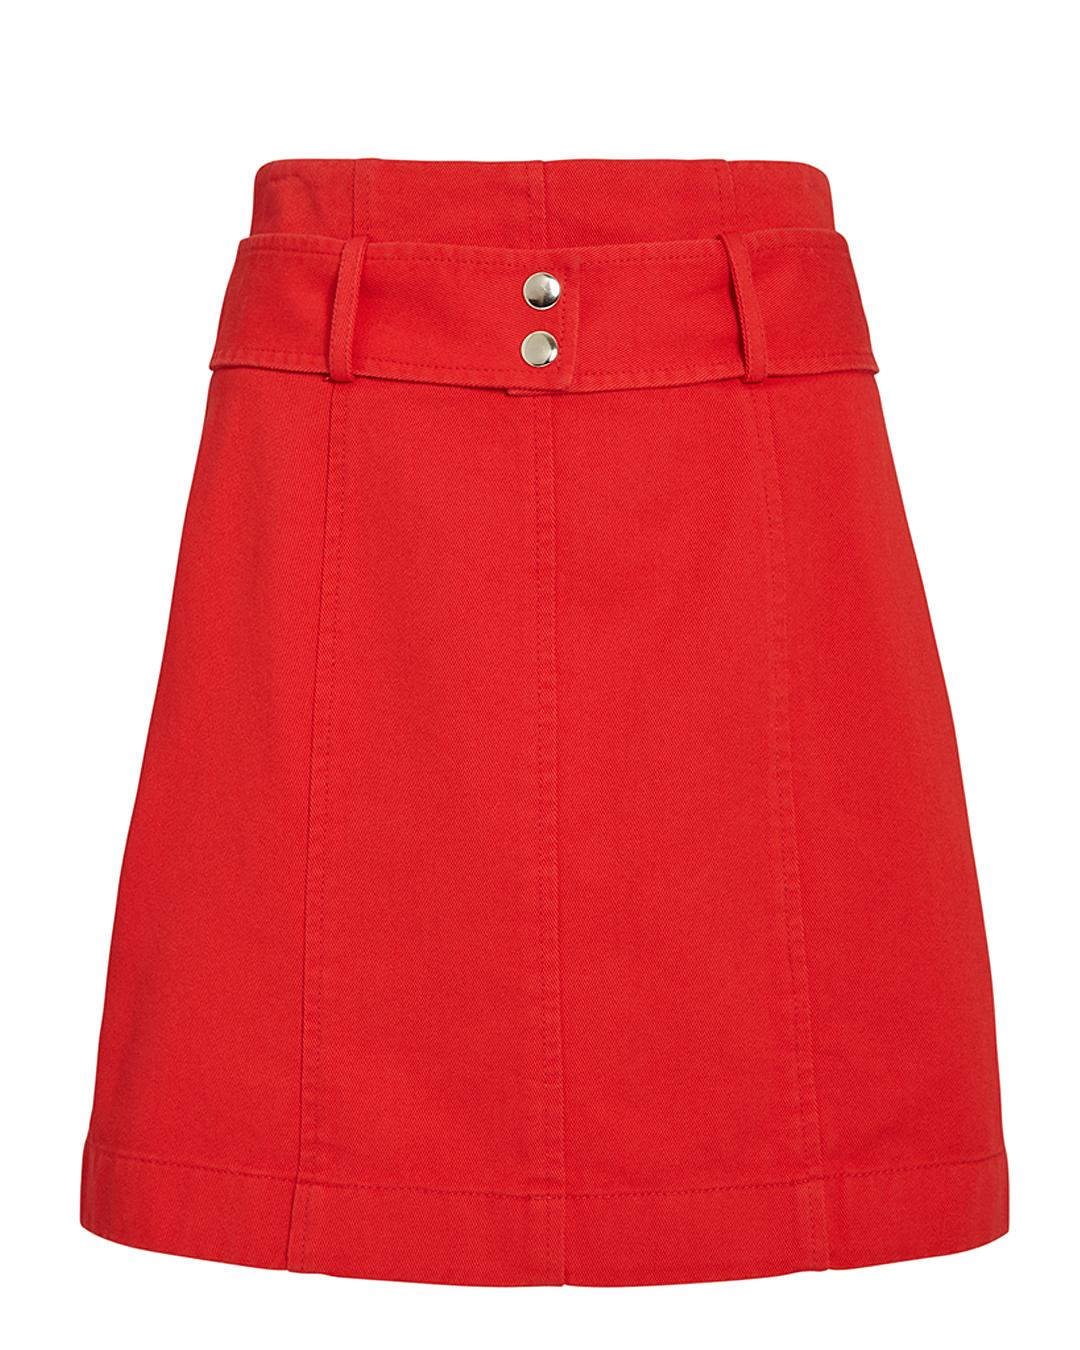 EXCLUSIVE FOR INTERMIX Abigail Mini Skirt